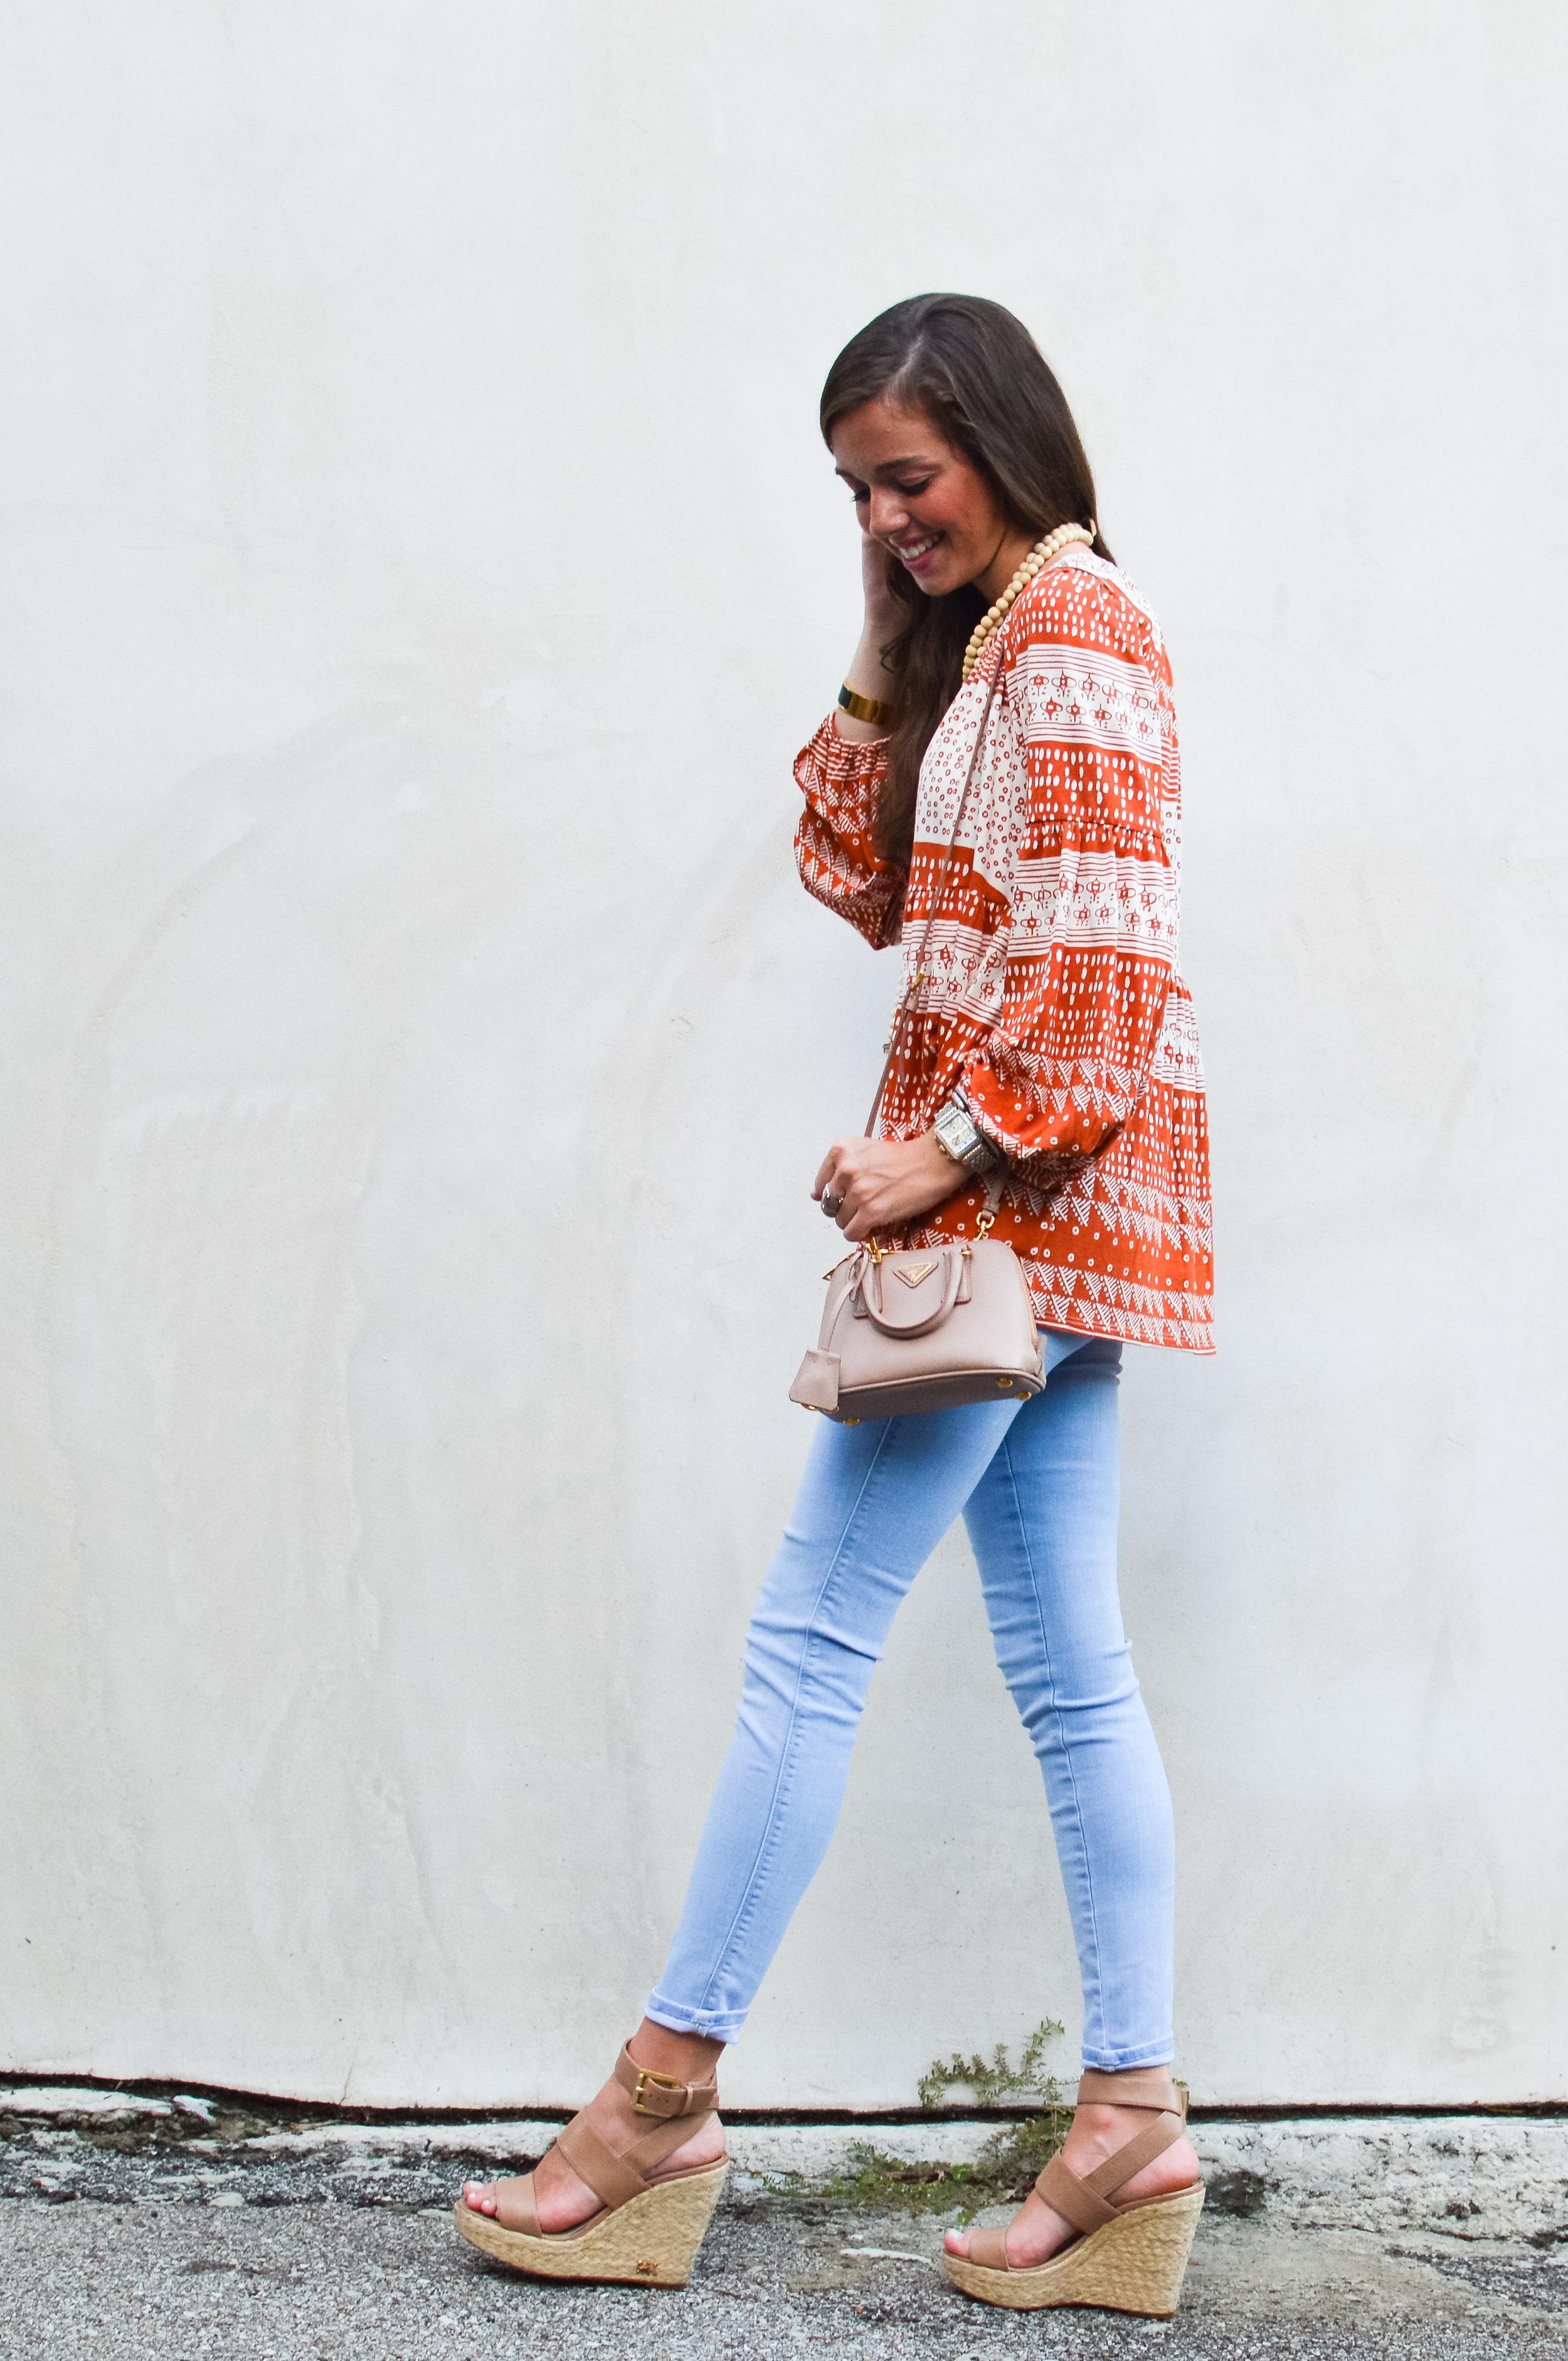 fashion blogger lcb style rachel pally (11 of 18).jpg